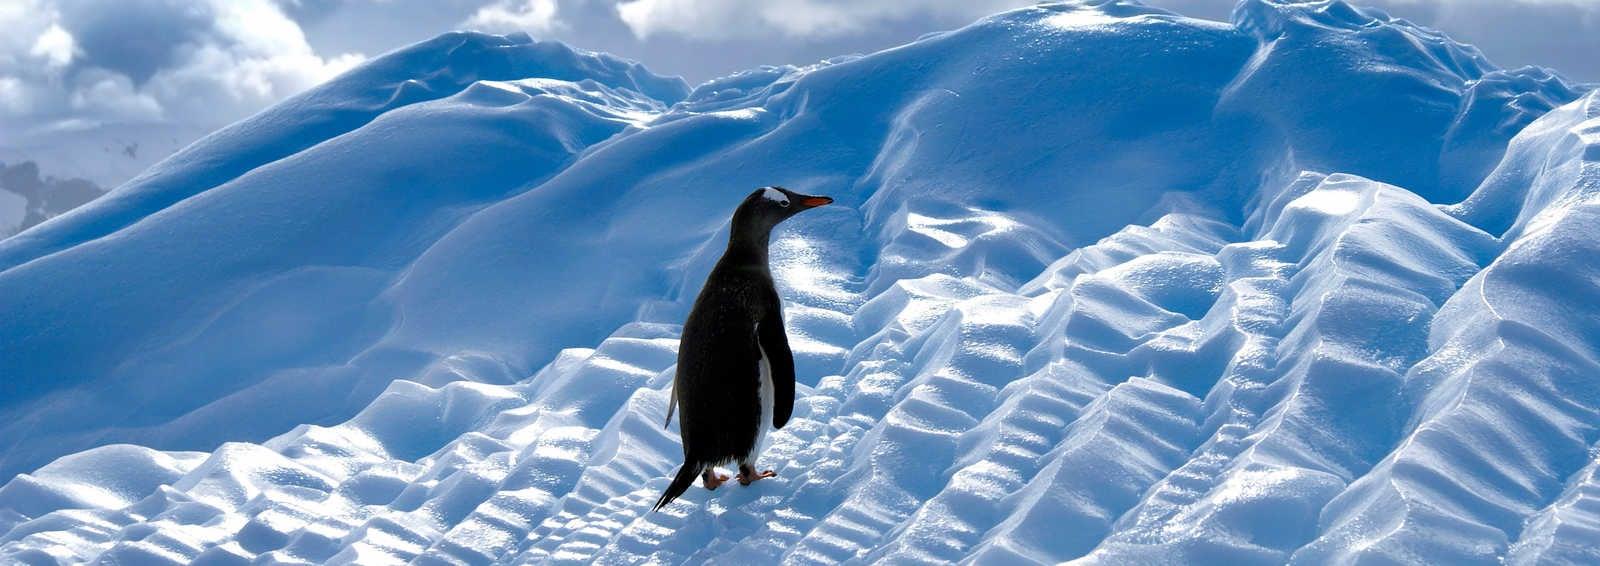 Gentoo penguin on ice